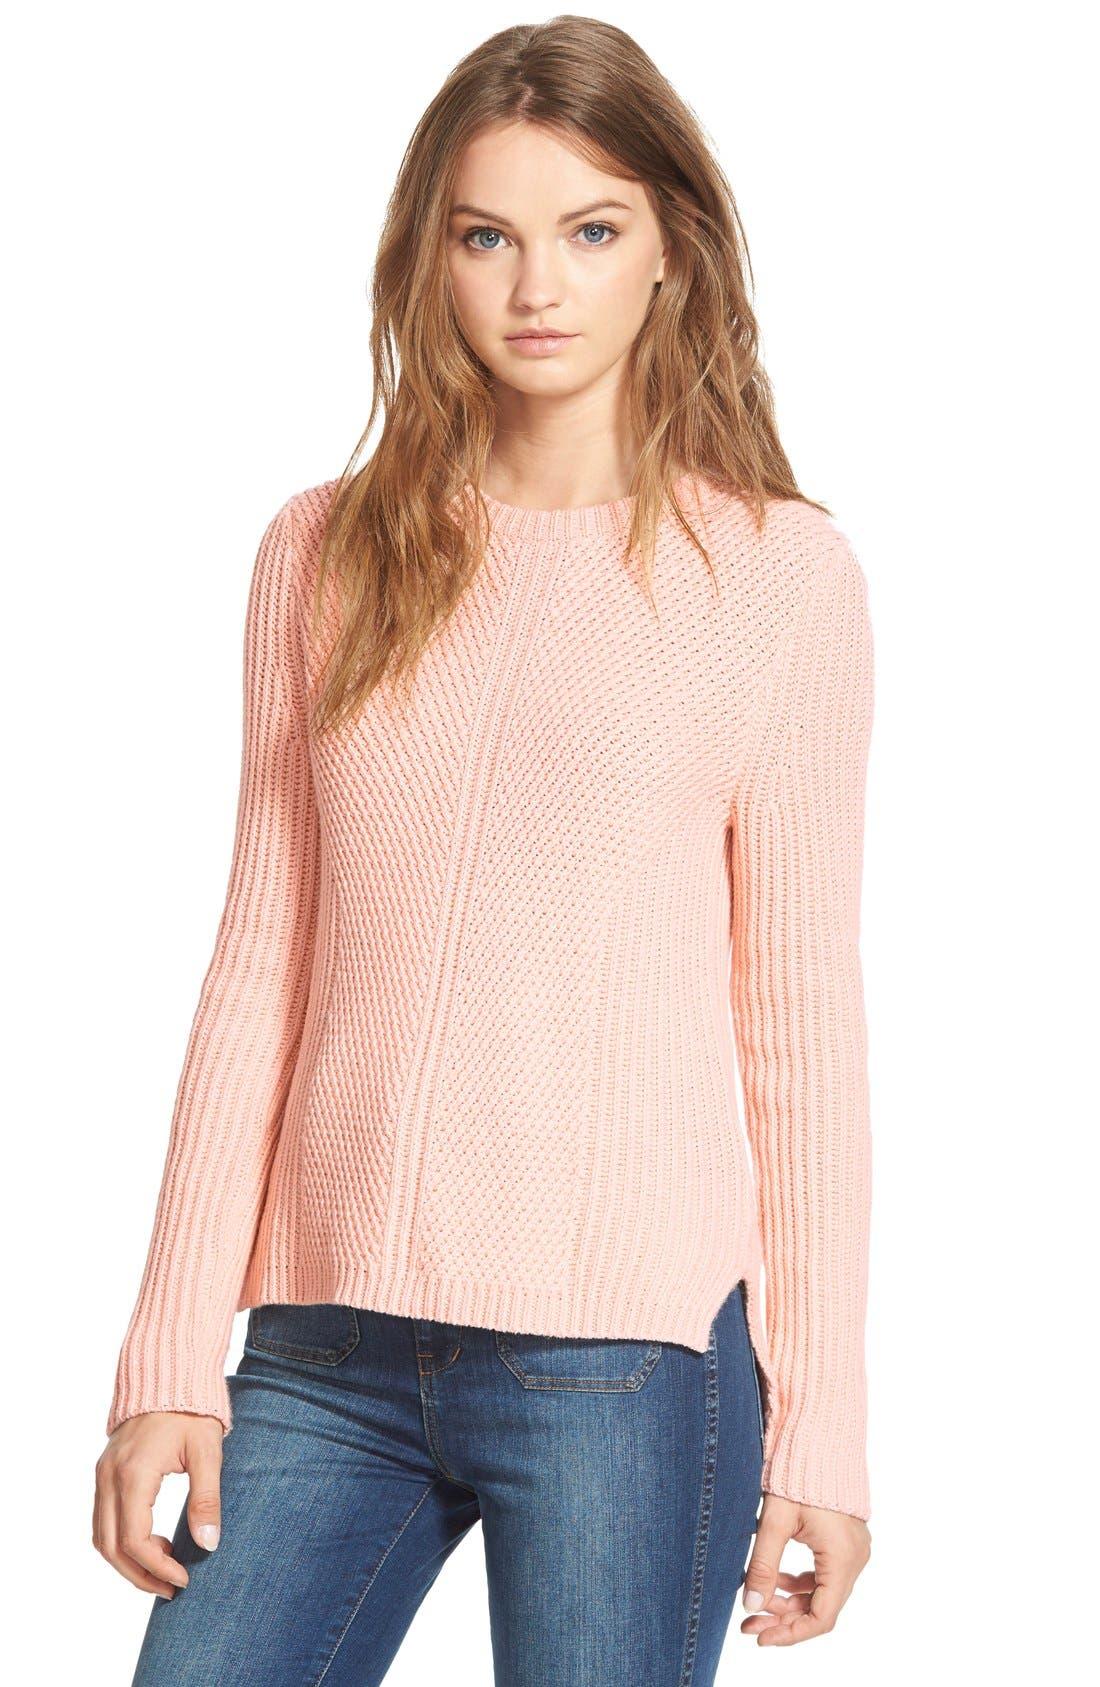 Main Image - Madewell 'Holcomb' Texture Sweater